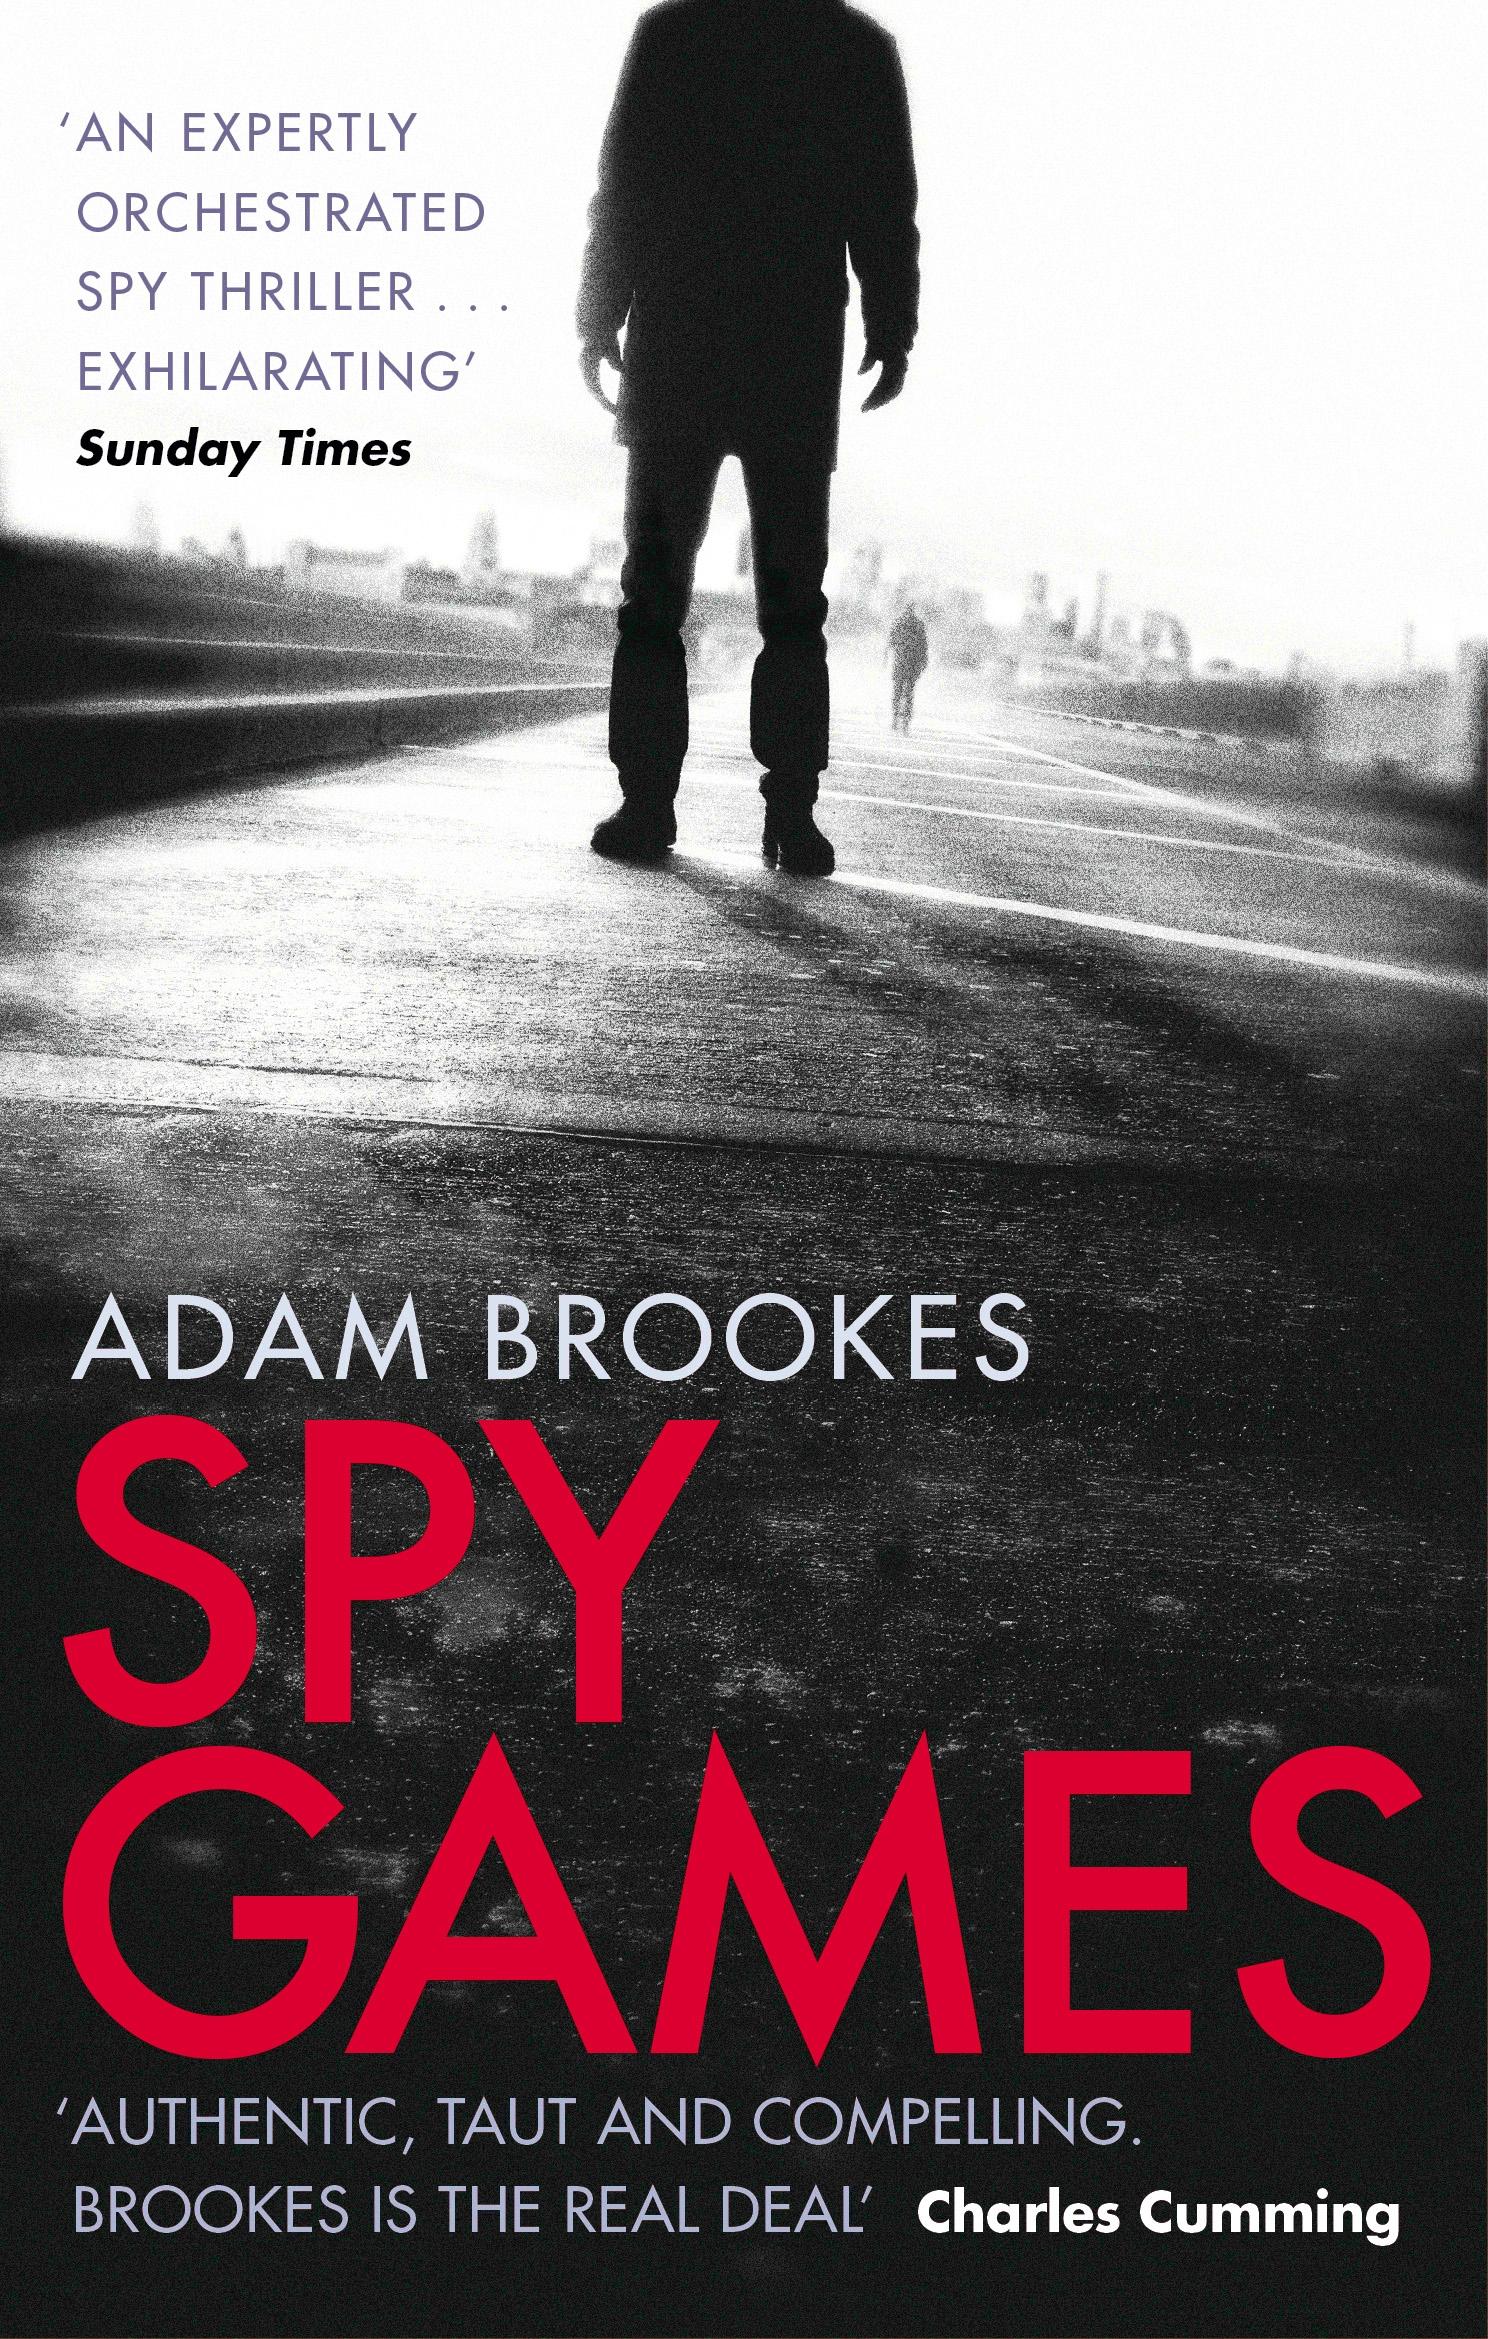 adam-brookes-author-spy-games